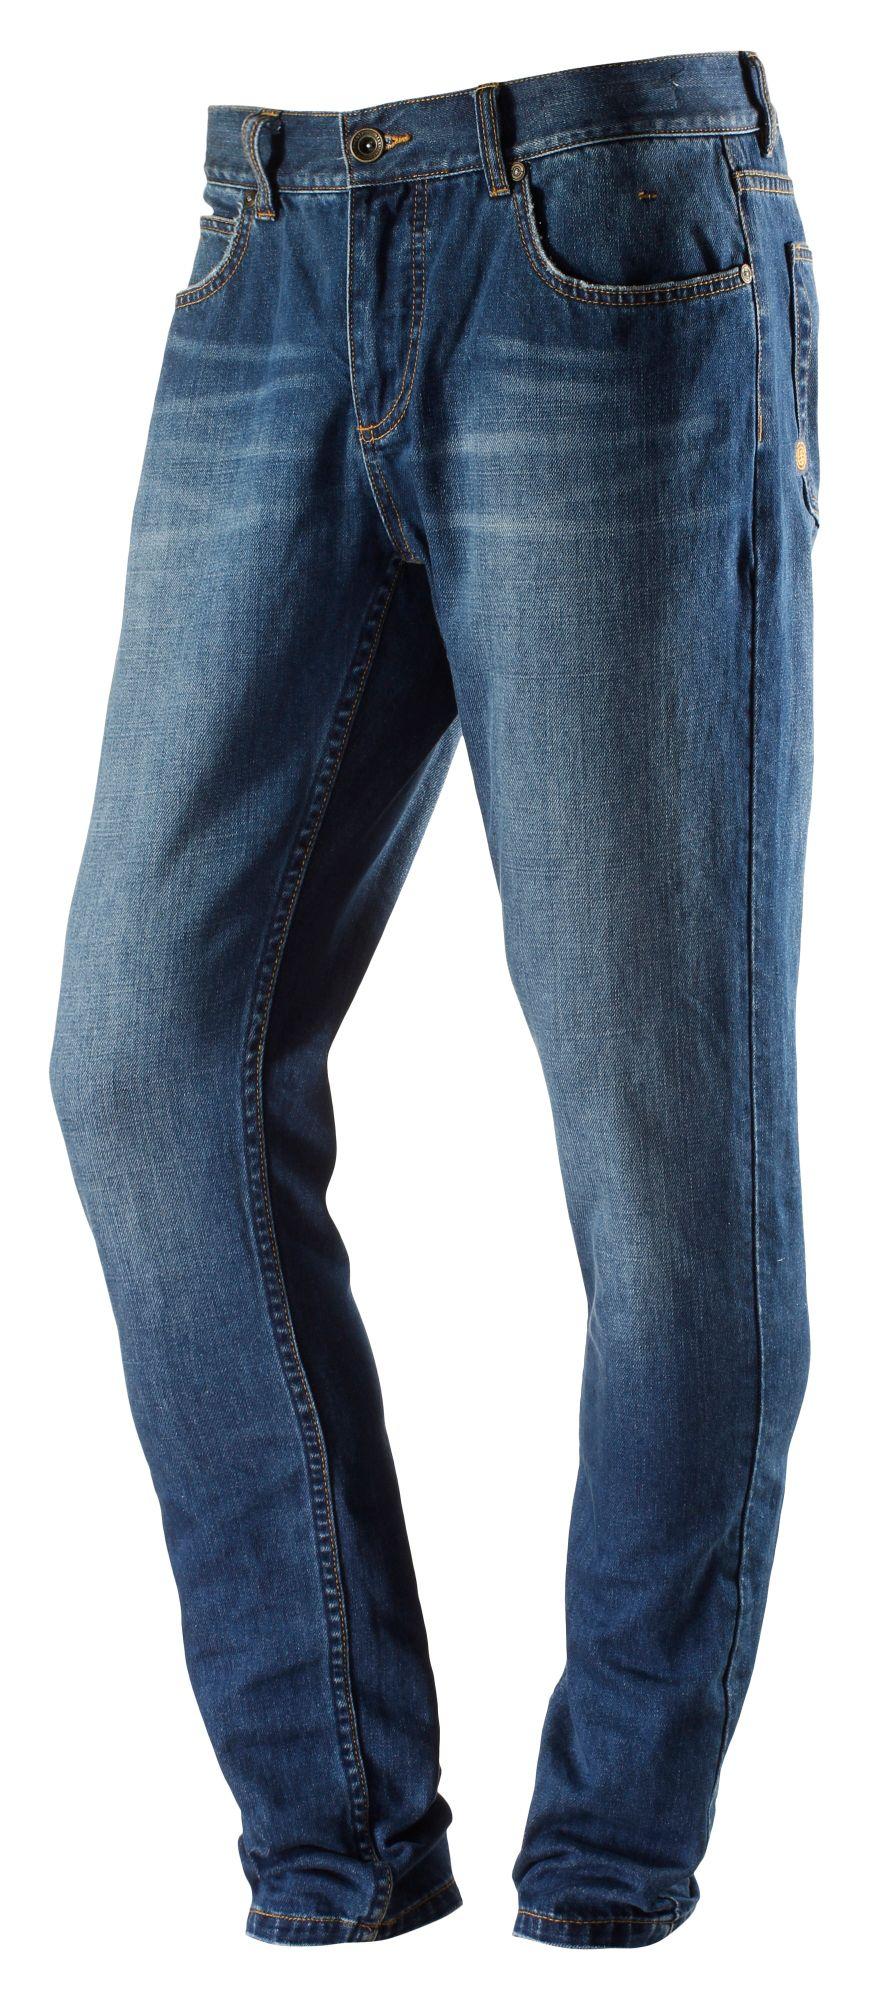 Element Clark Loose Fit Jeans Herren in blau, Größe 32